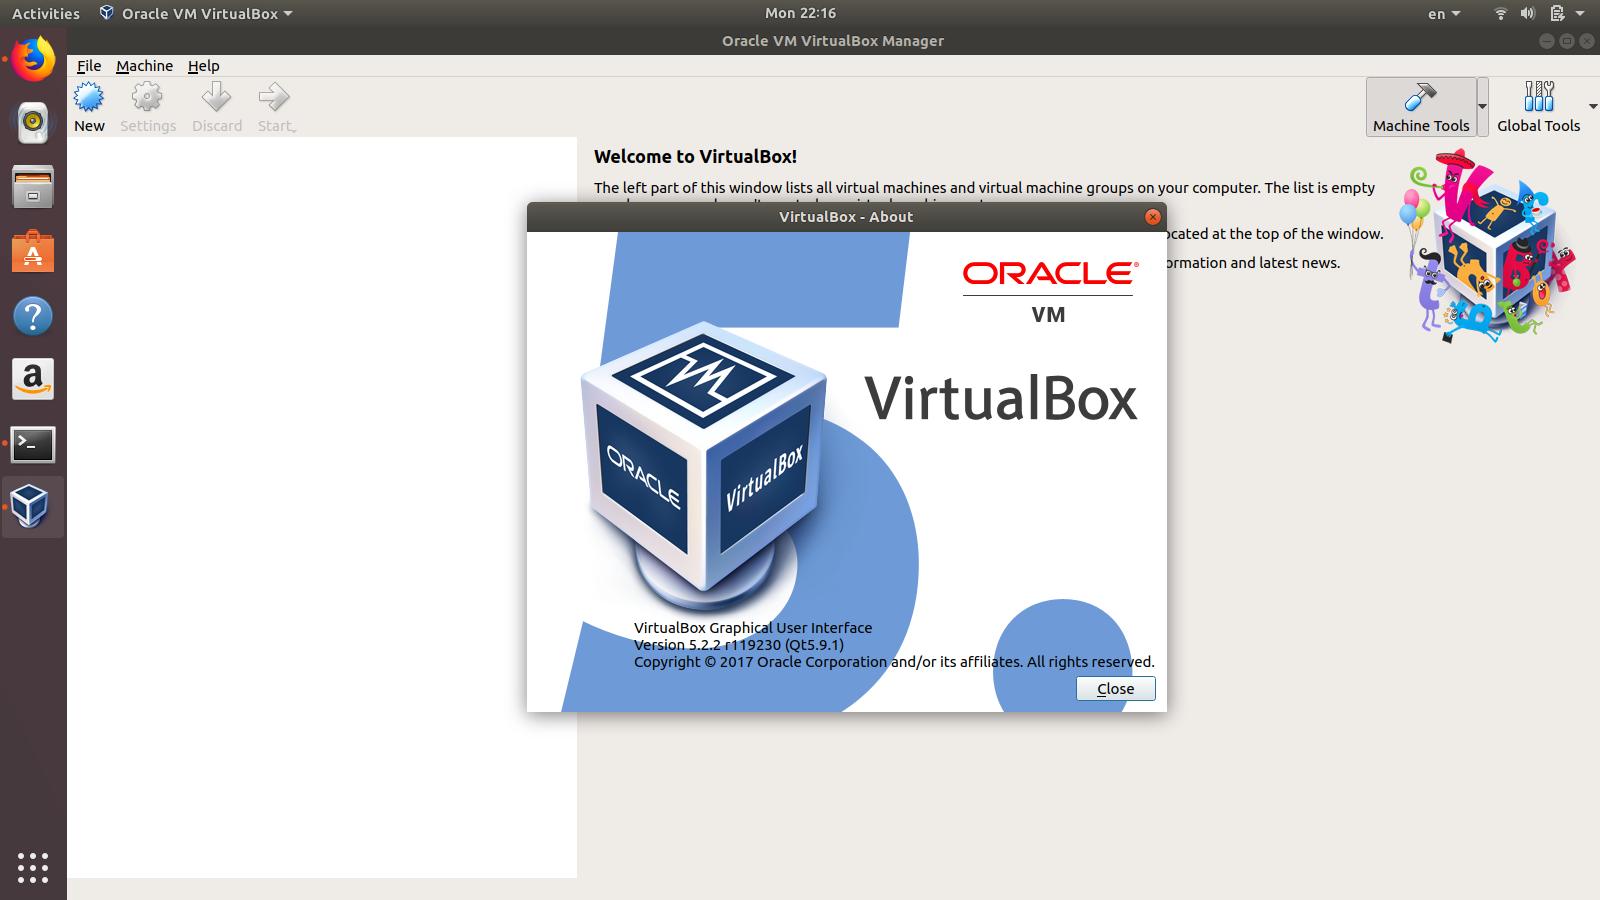 How to install program on Ubuntu: How to install Virtualbox